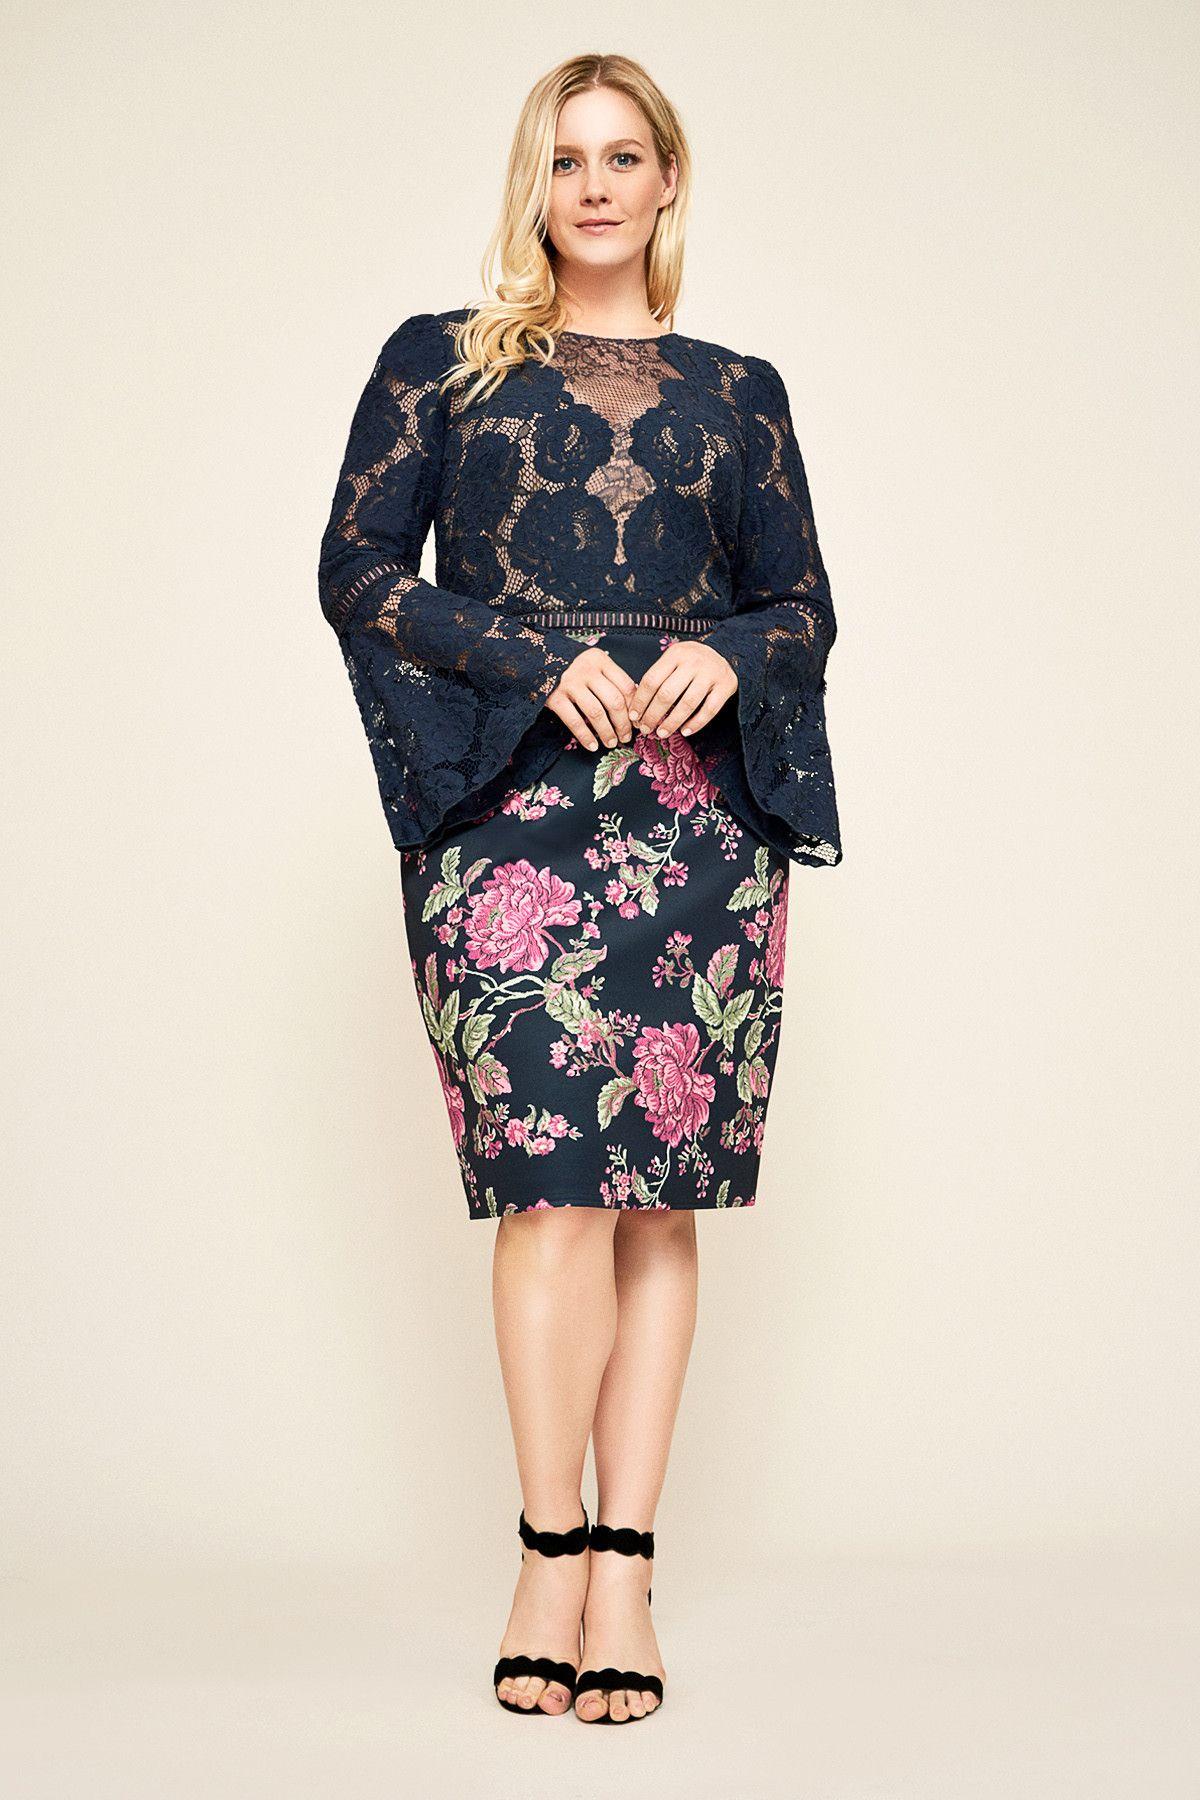 8b6521f8ec4 Dorothy Neoprene Lace Dress - PLUS SIZE | Tadashi Shoji | Future ...